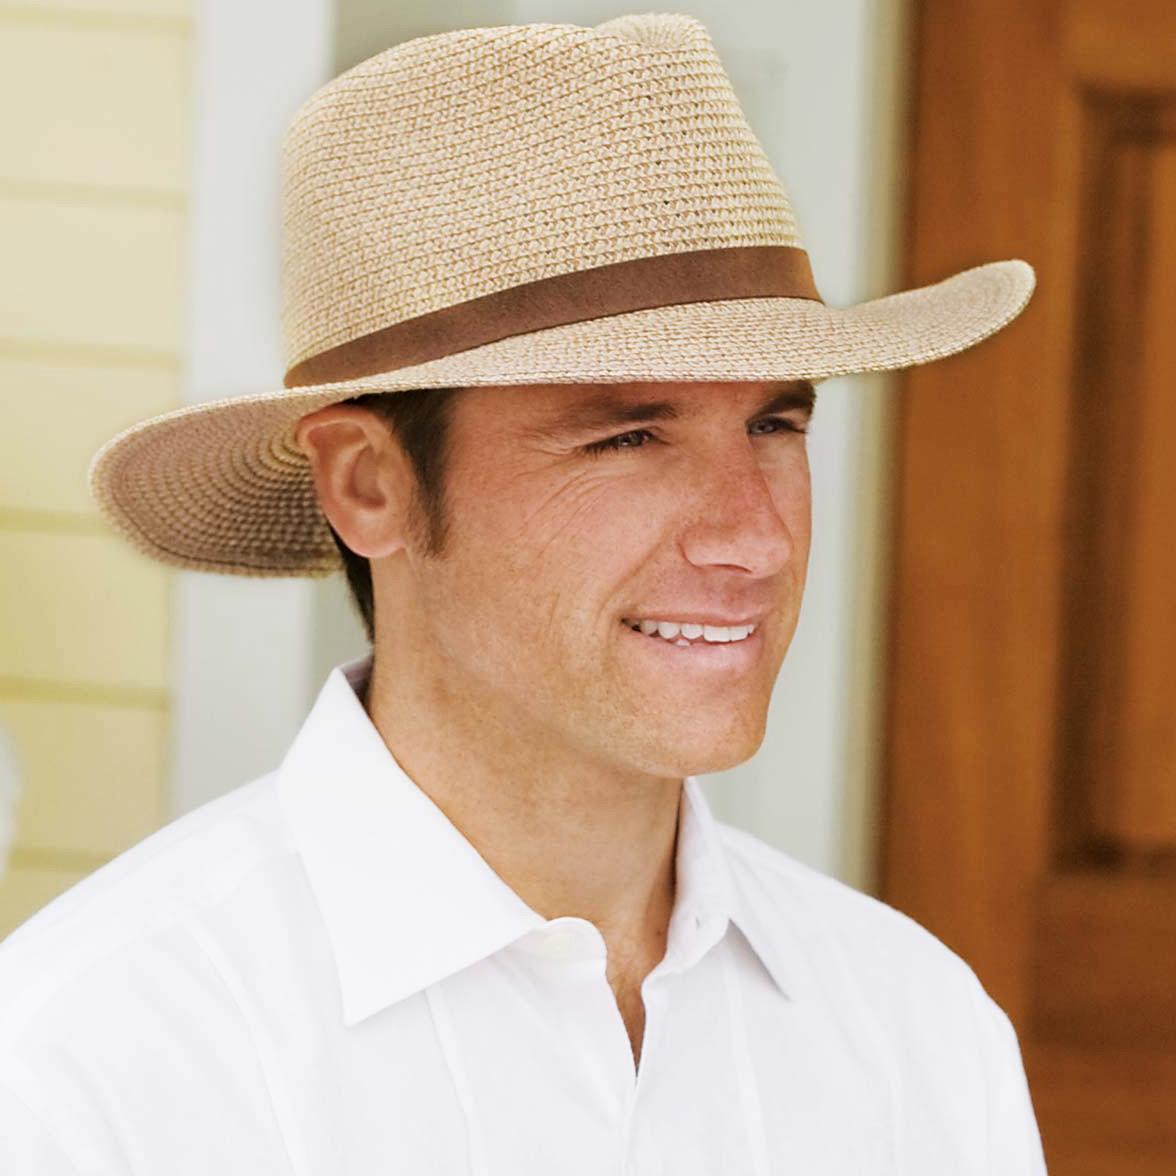 vamos-usar-chapeu-masculino-estilo-alexandre-taleb (1) f8f101b2cfc